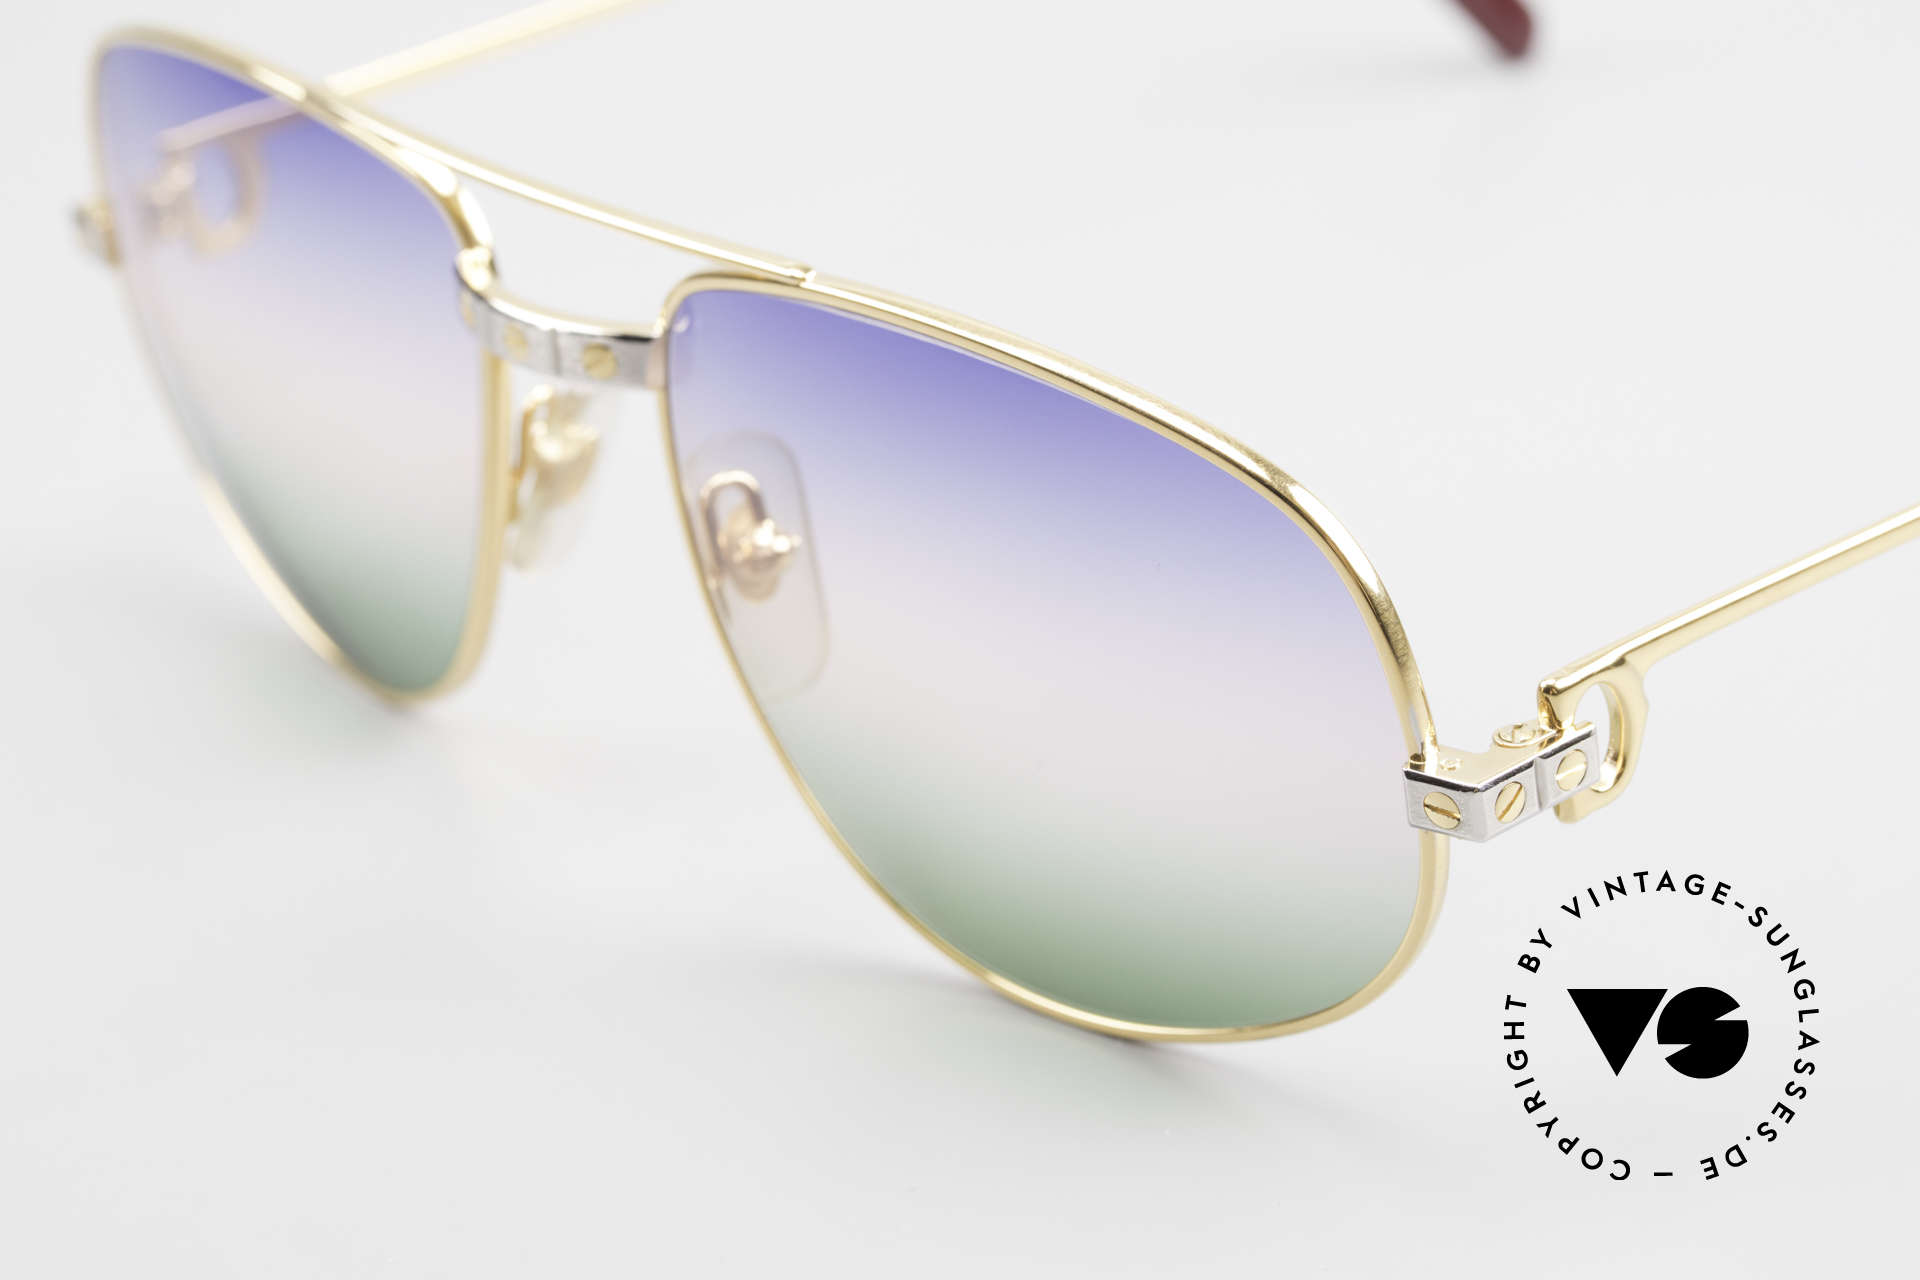 Cartier Romance Santos - L 80s Luxury Vintage Sunglasses, 22ct gold-plated frame (like all vintage Cartier originals), Made for Men